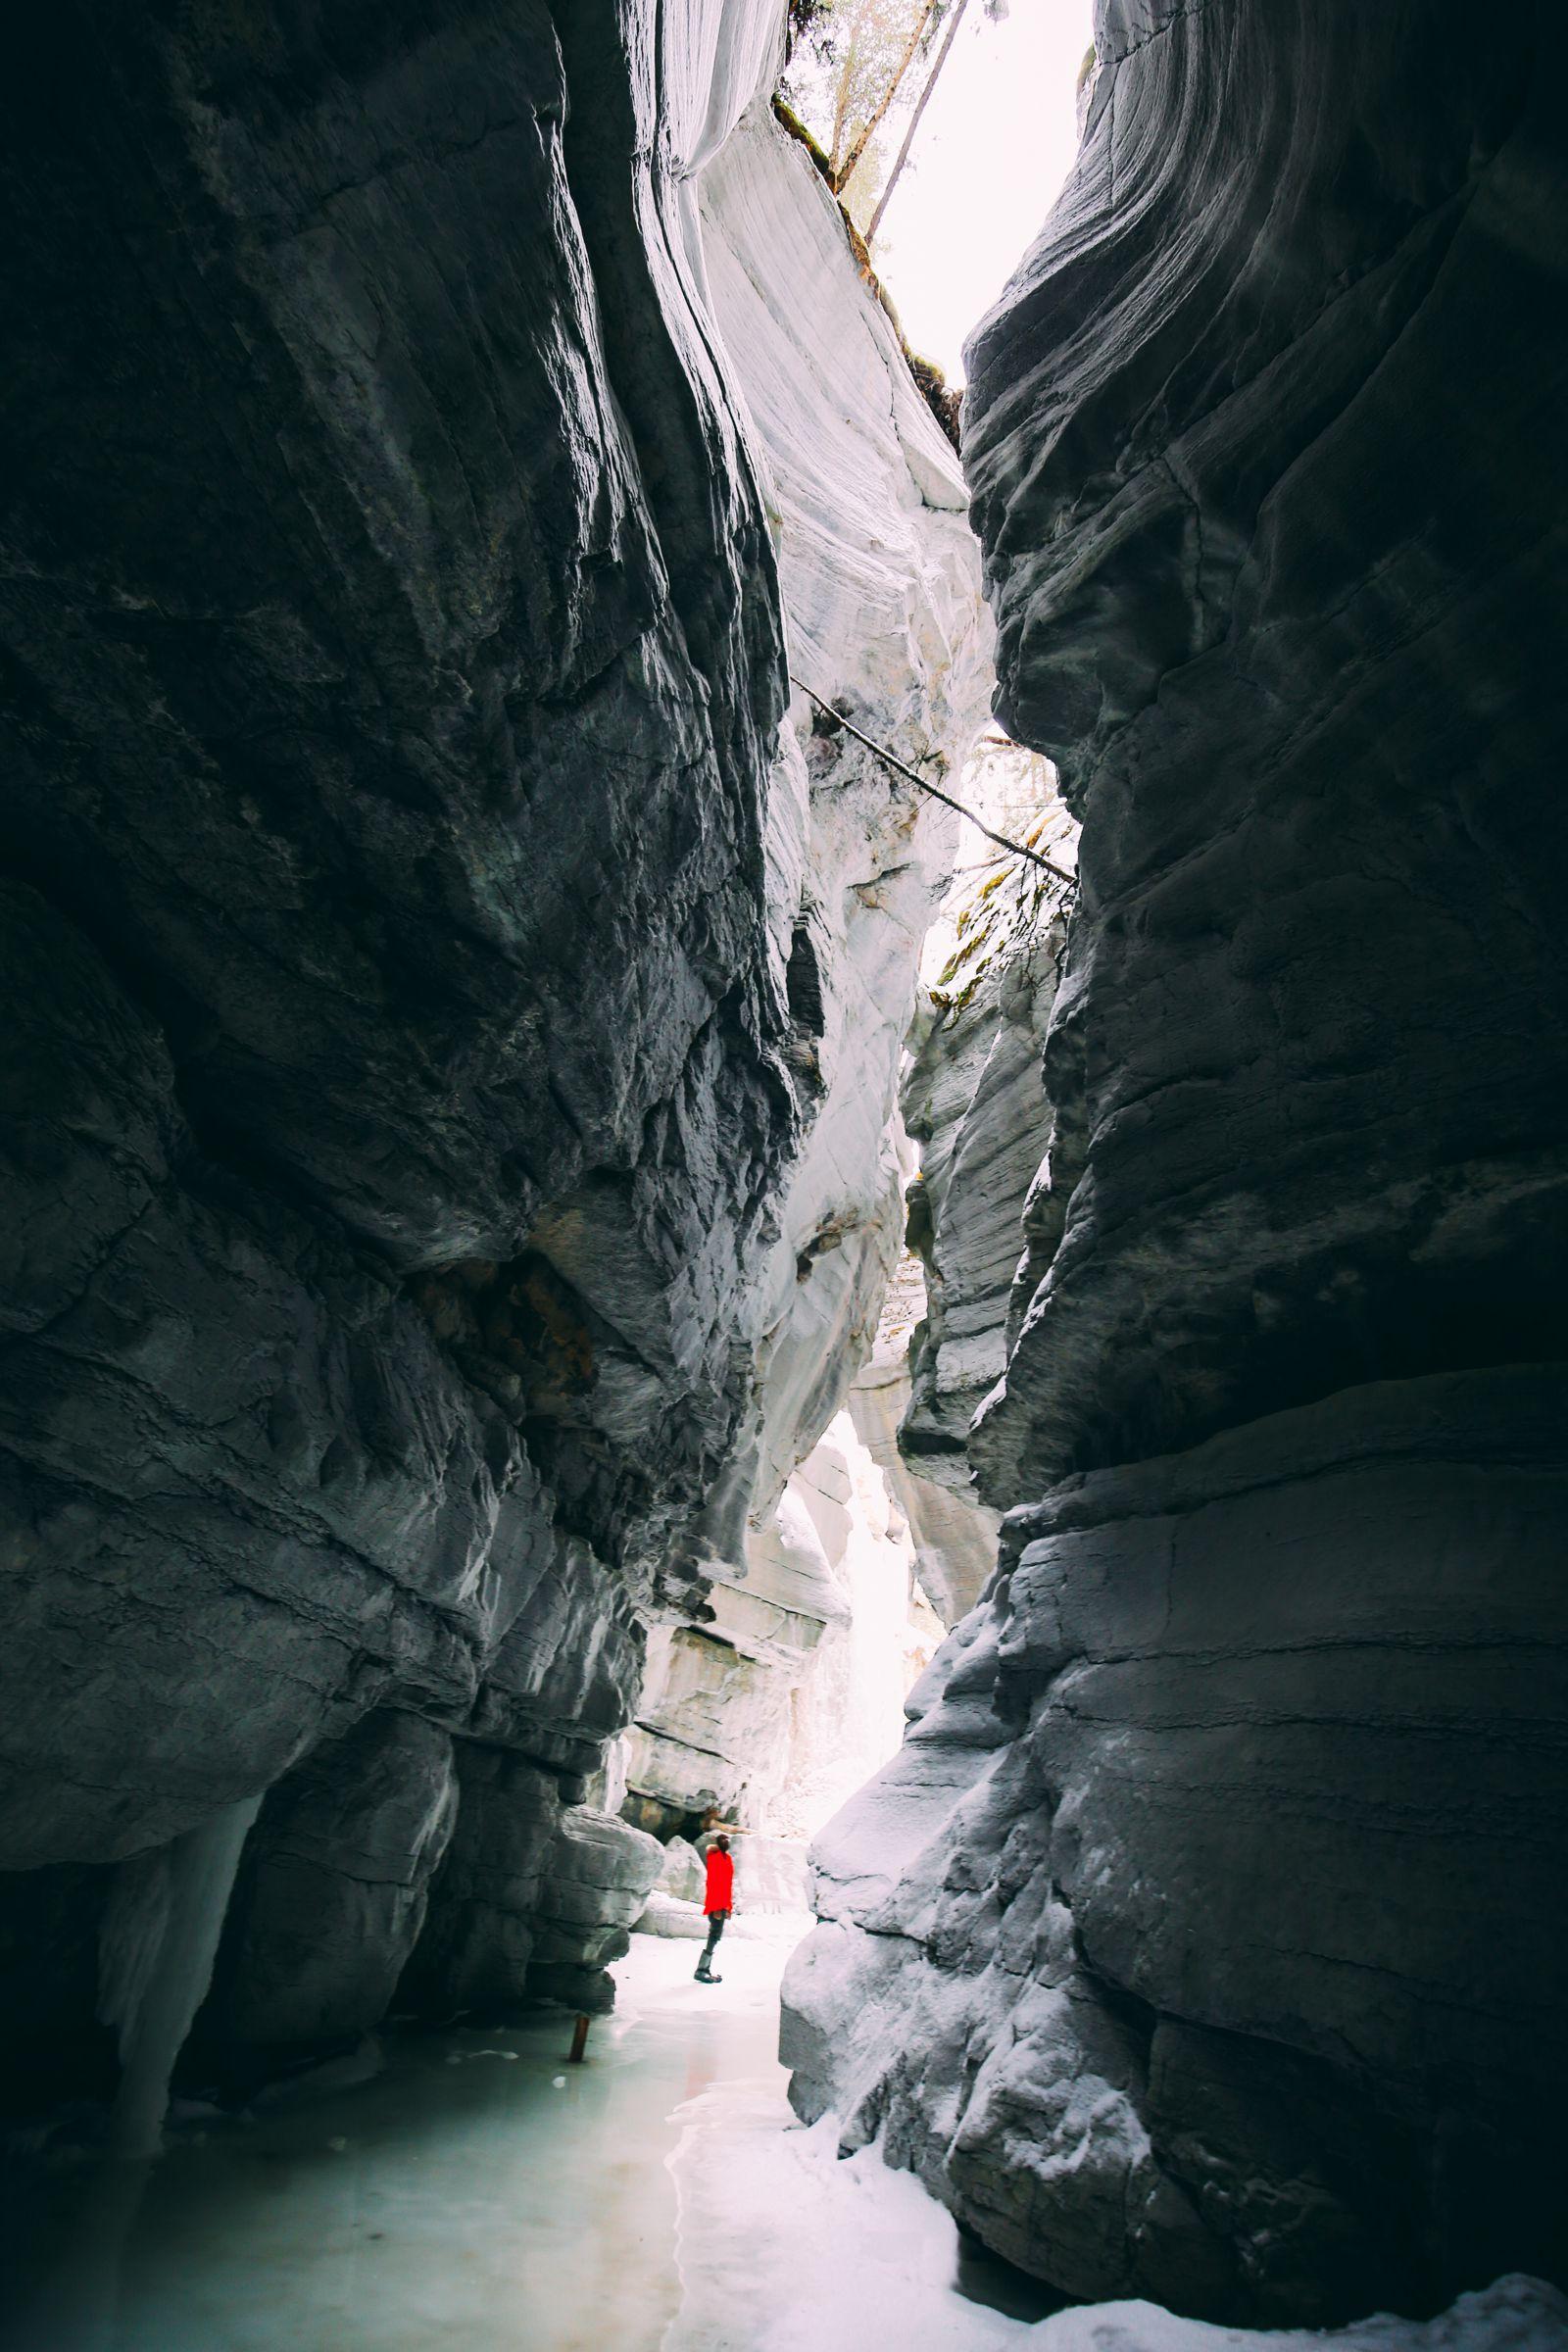 The Most Beautiful Place In Jasper (Canada) You've Never Heard Of! (45)